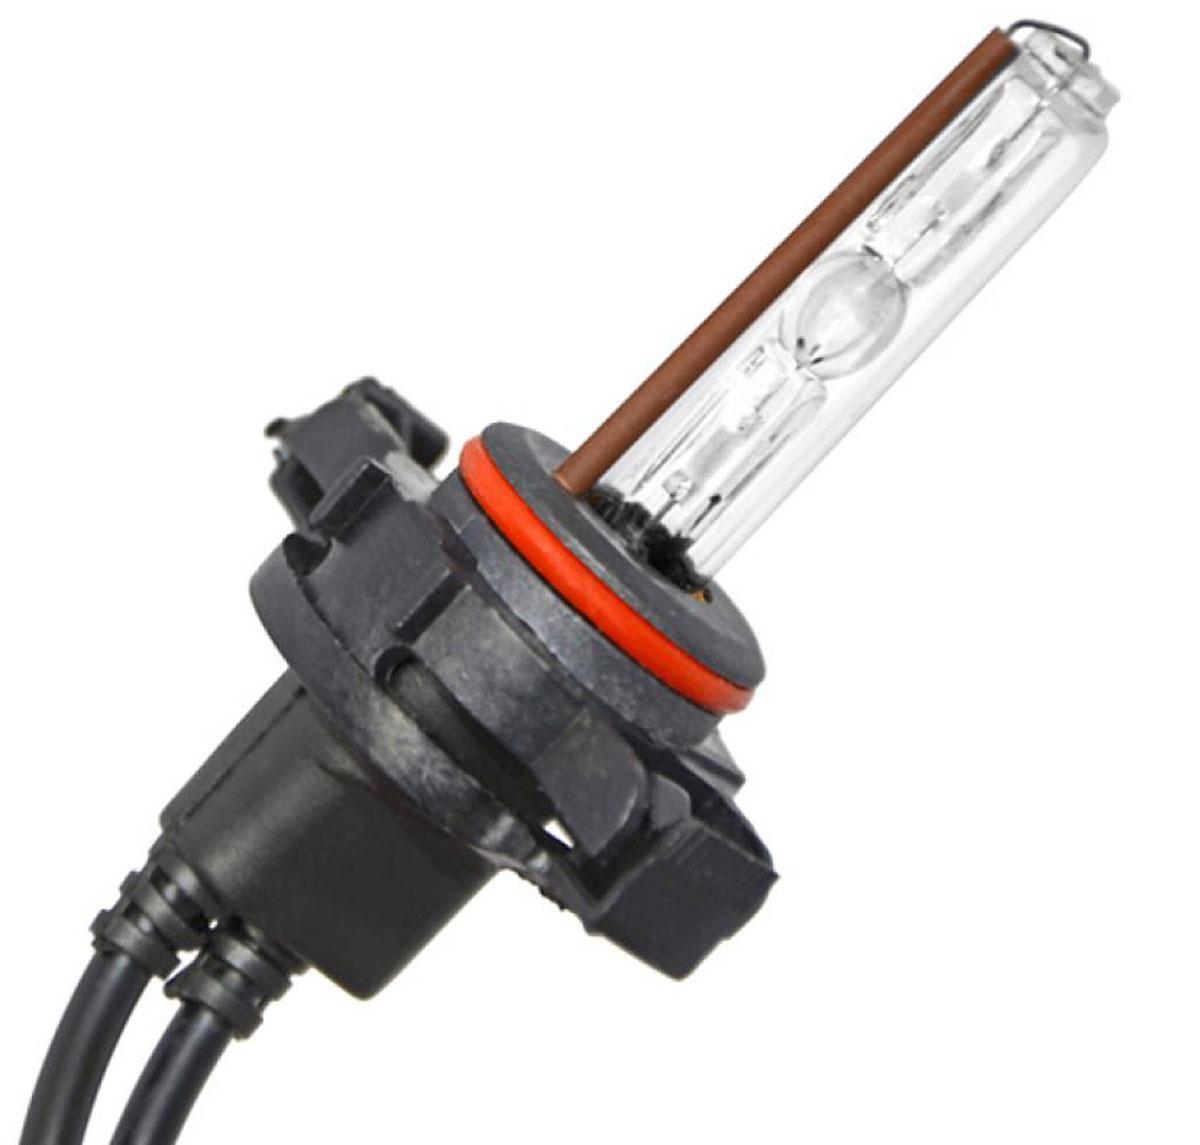 Лампа автомобильная ксеноновая Clearlight, для фар, цоколь H16, 4300K, 35W, 2 шт10503Надежная ксенононовая лампа для установки в головную оптику автомобиля со спектром света 4300K, 5000К, 6000K, 8000K